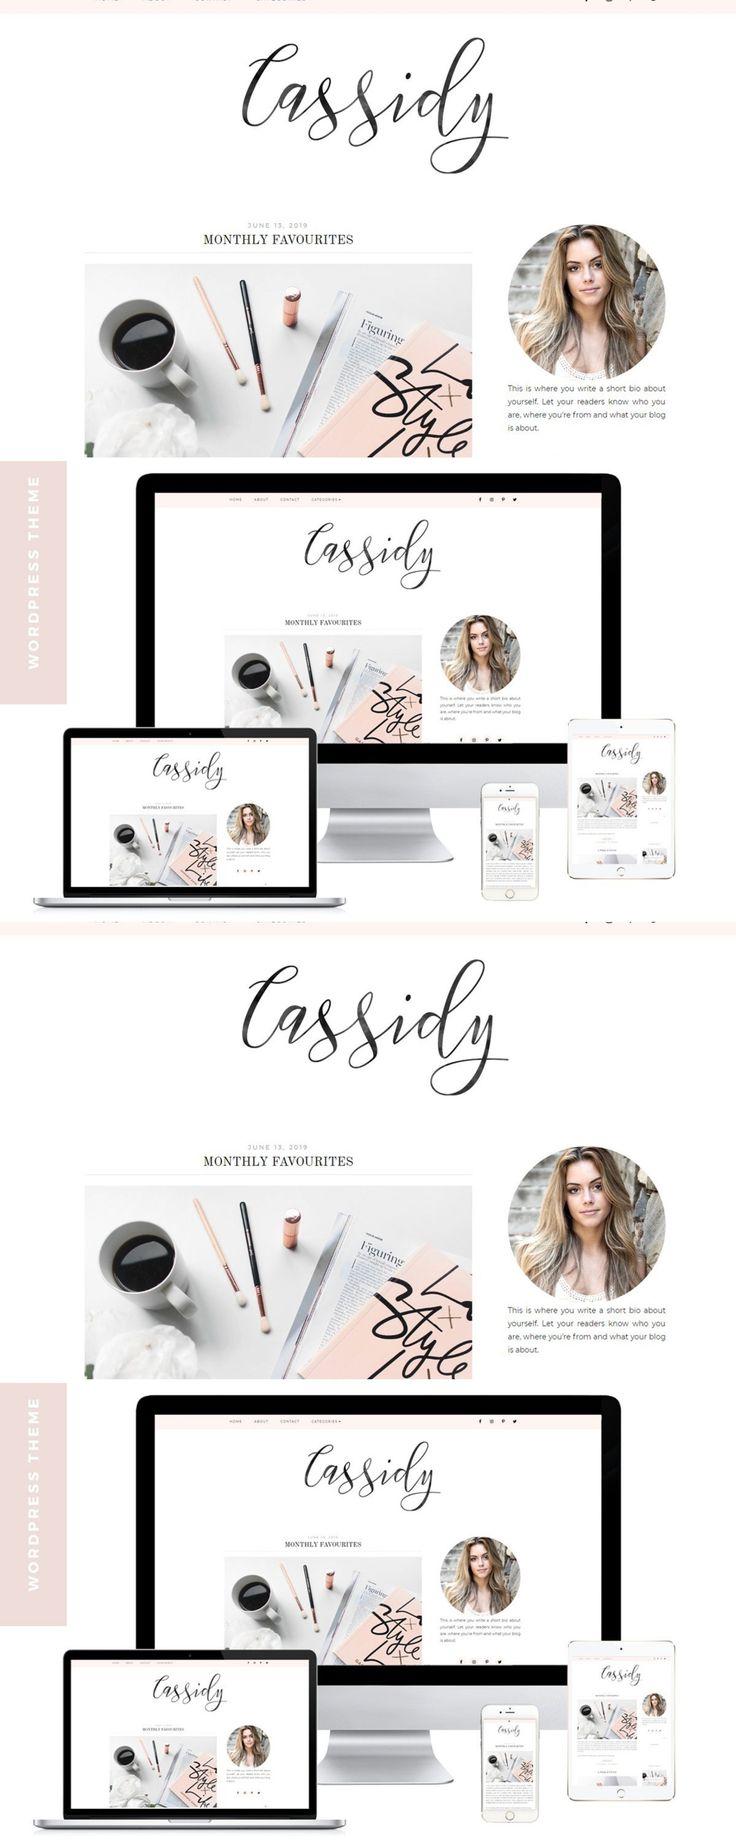 Wordpress Blog Theme Cassidy Blog themes wordpress